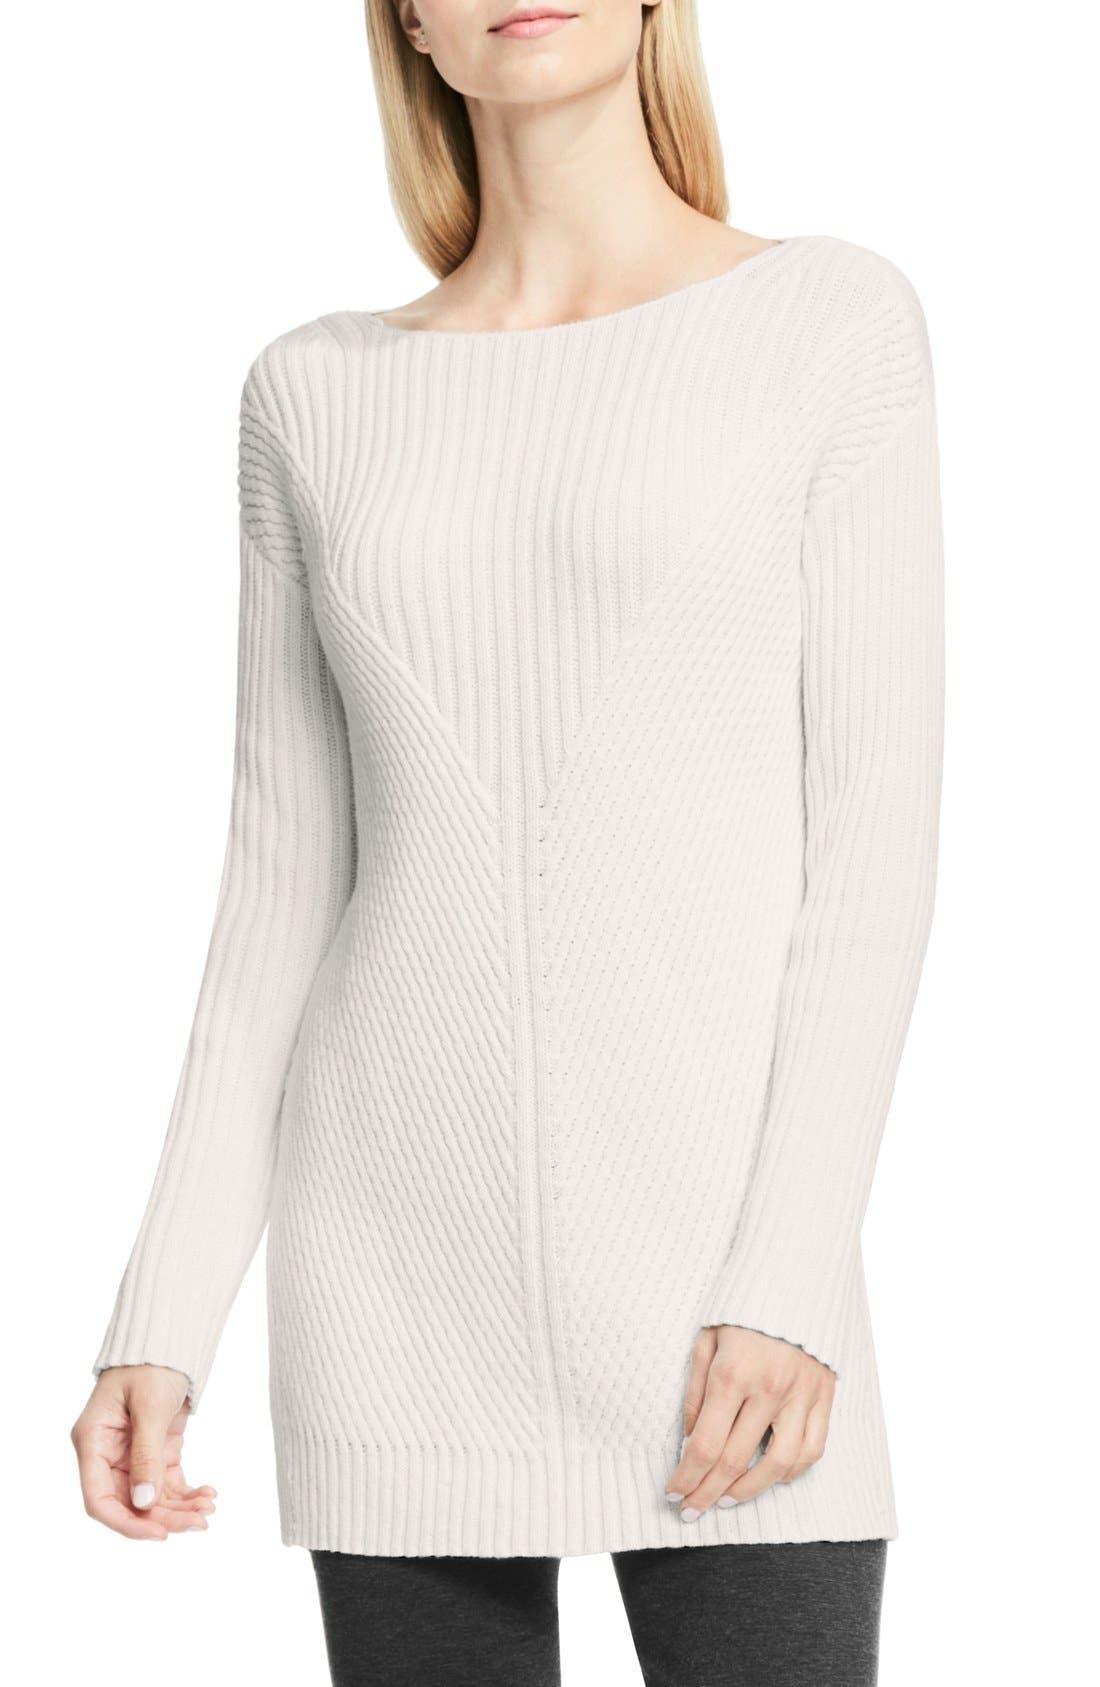 Alternate Image 1 Selected - Vince Camuto Rib Knit Long Sweater (Petite)